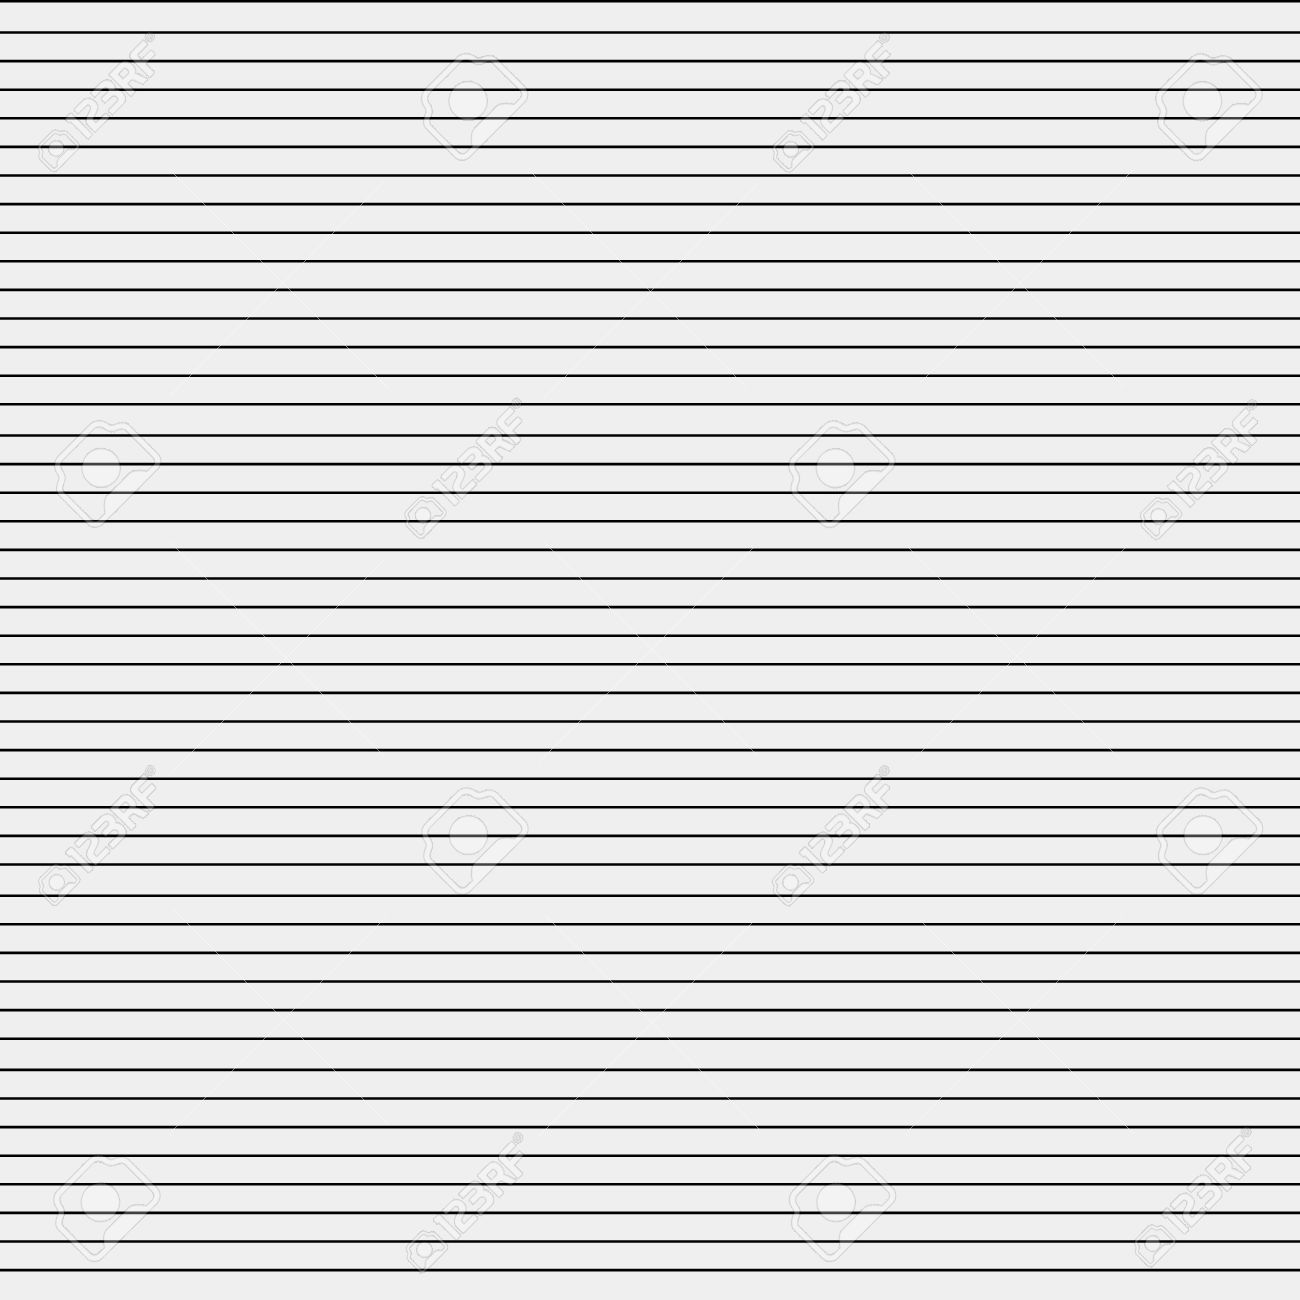 seamless simple monochrome minimalistic pattern straight horizontal rh 123rf com horizontal line versus parallel slope horizontal line versus parallel slope